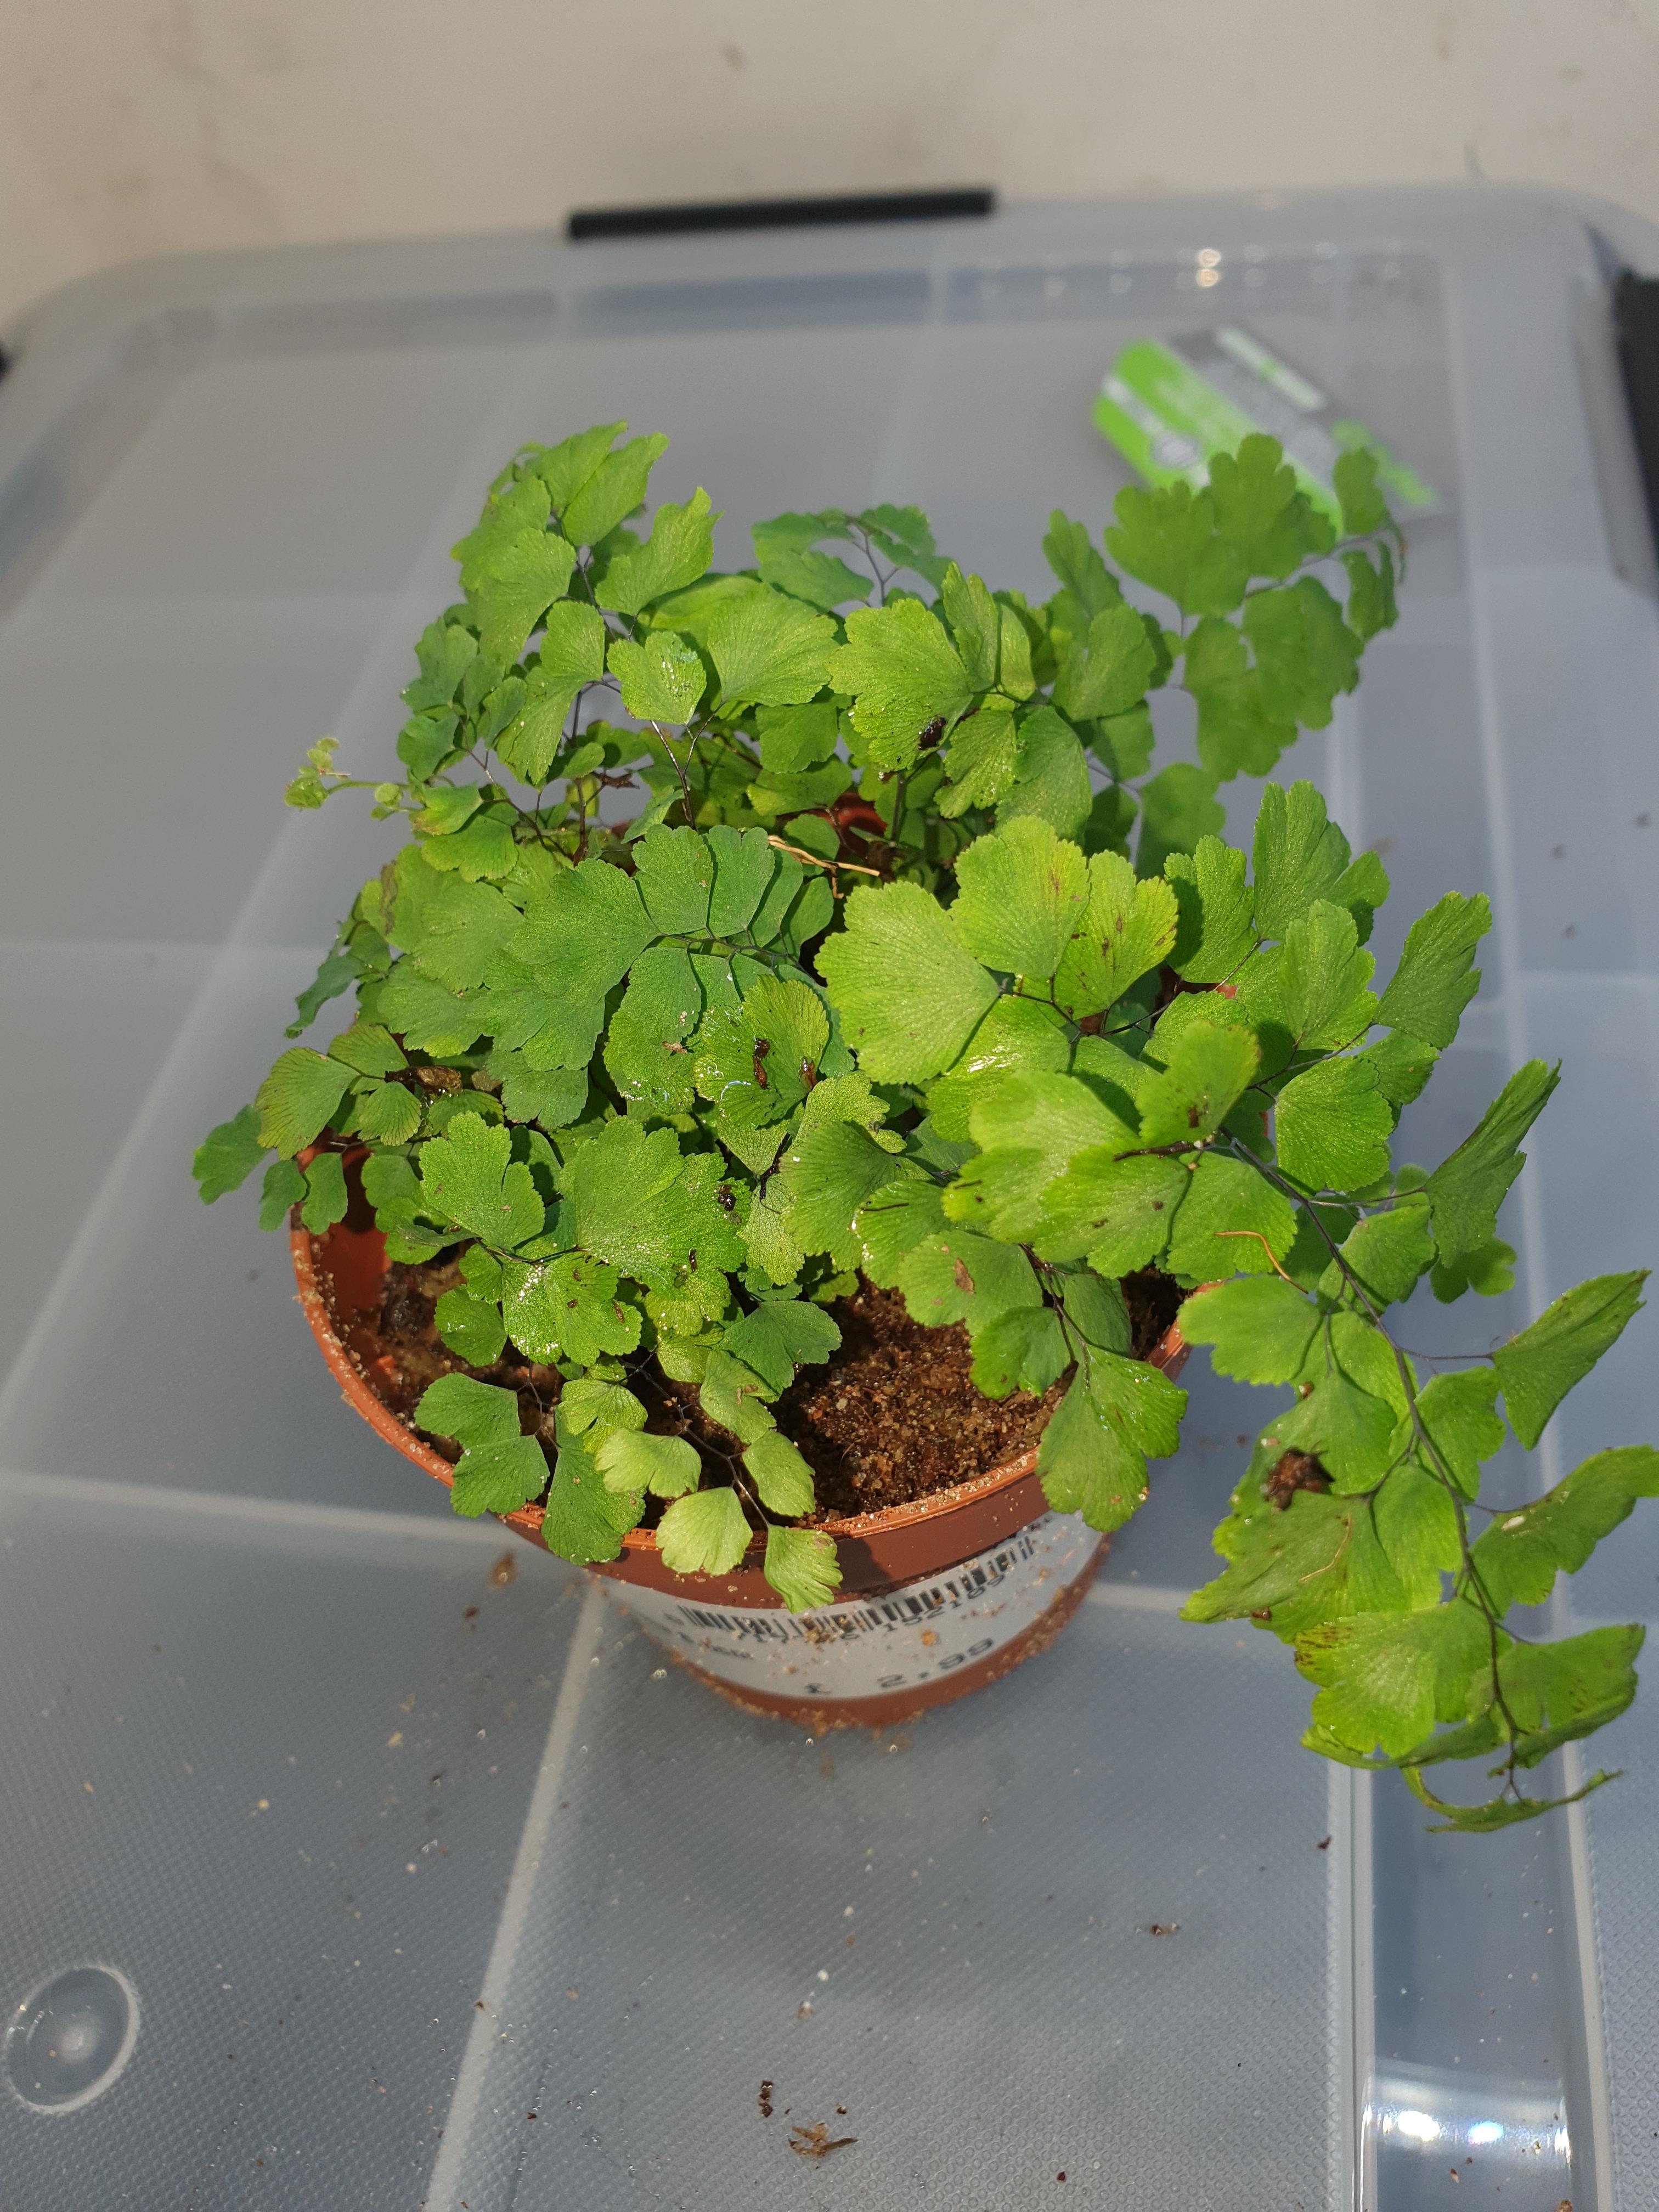 terrarium plants-15838620336874220893627677428187_1583862048358.jpg